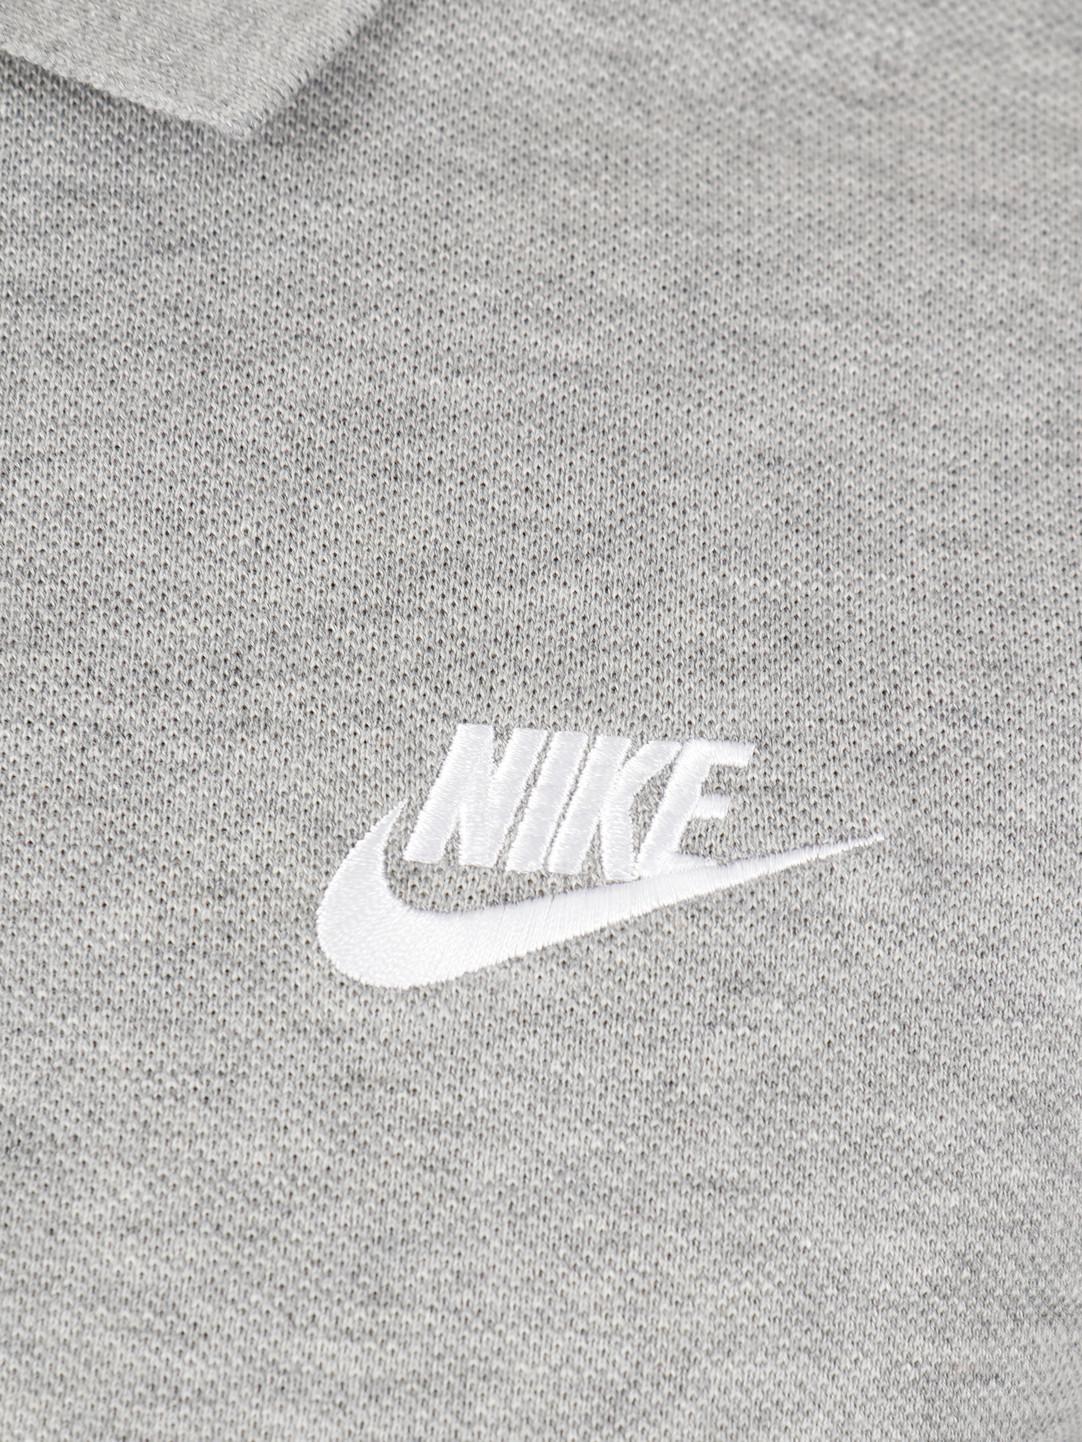 Nike Nike NSW Ce Polo Matchup Pq Dk Grey Heather White CJ4456-063